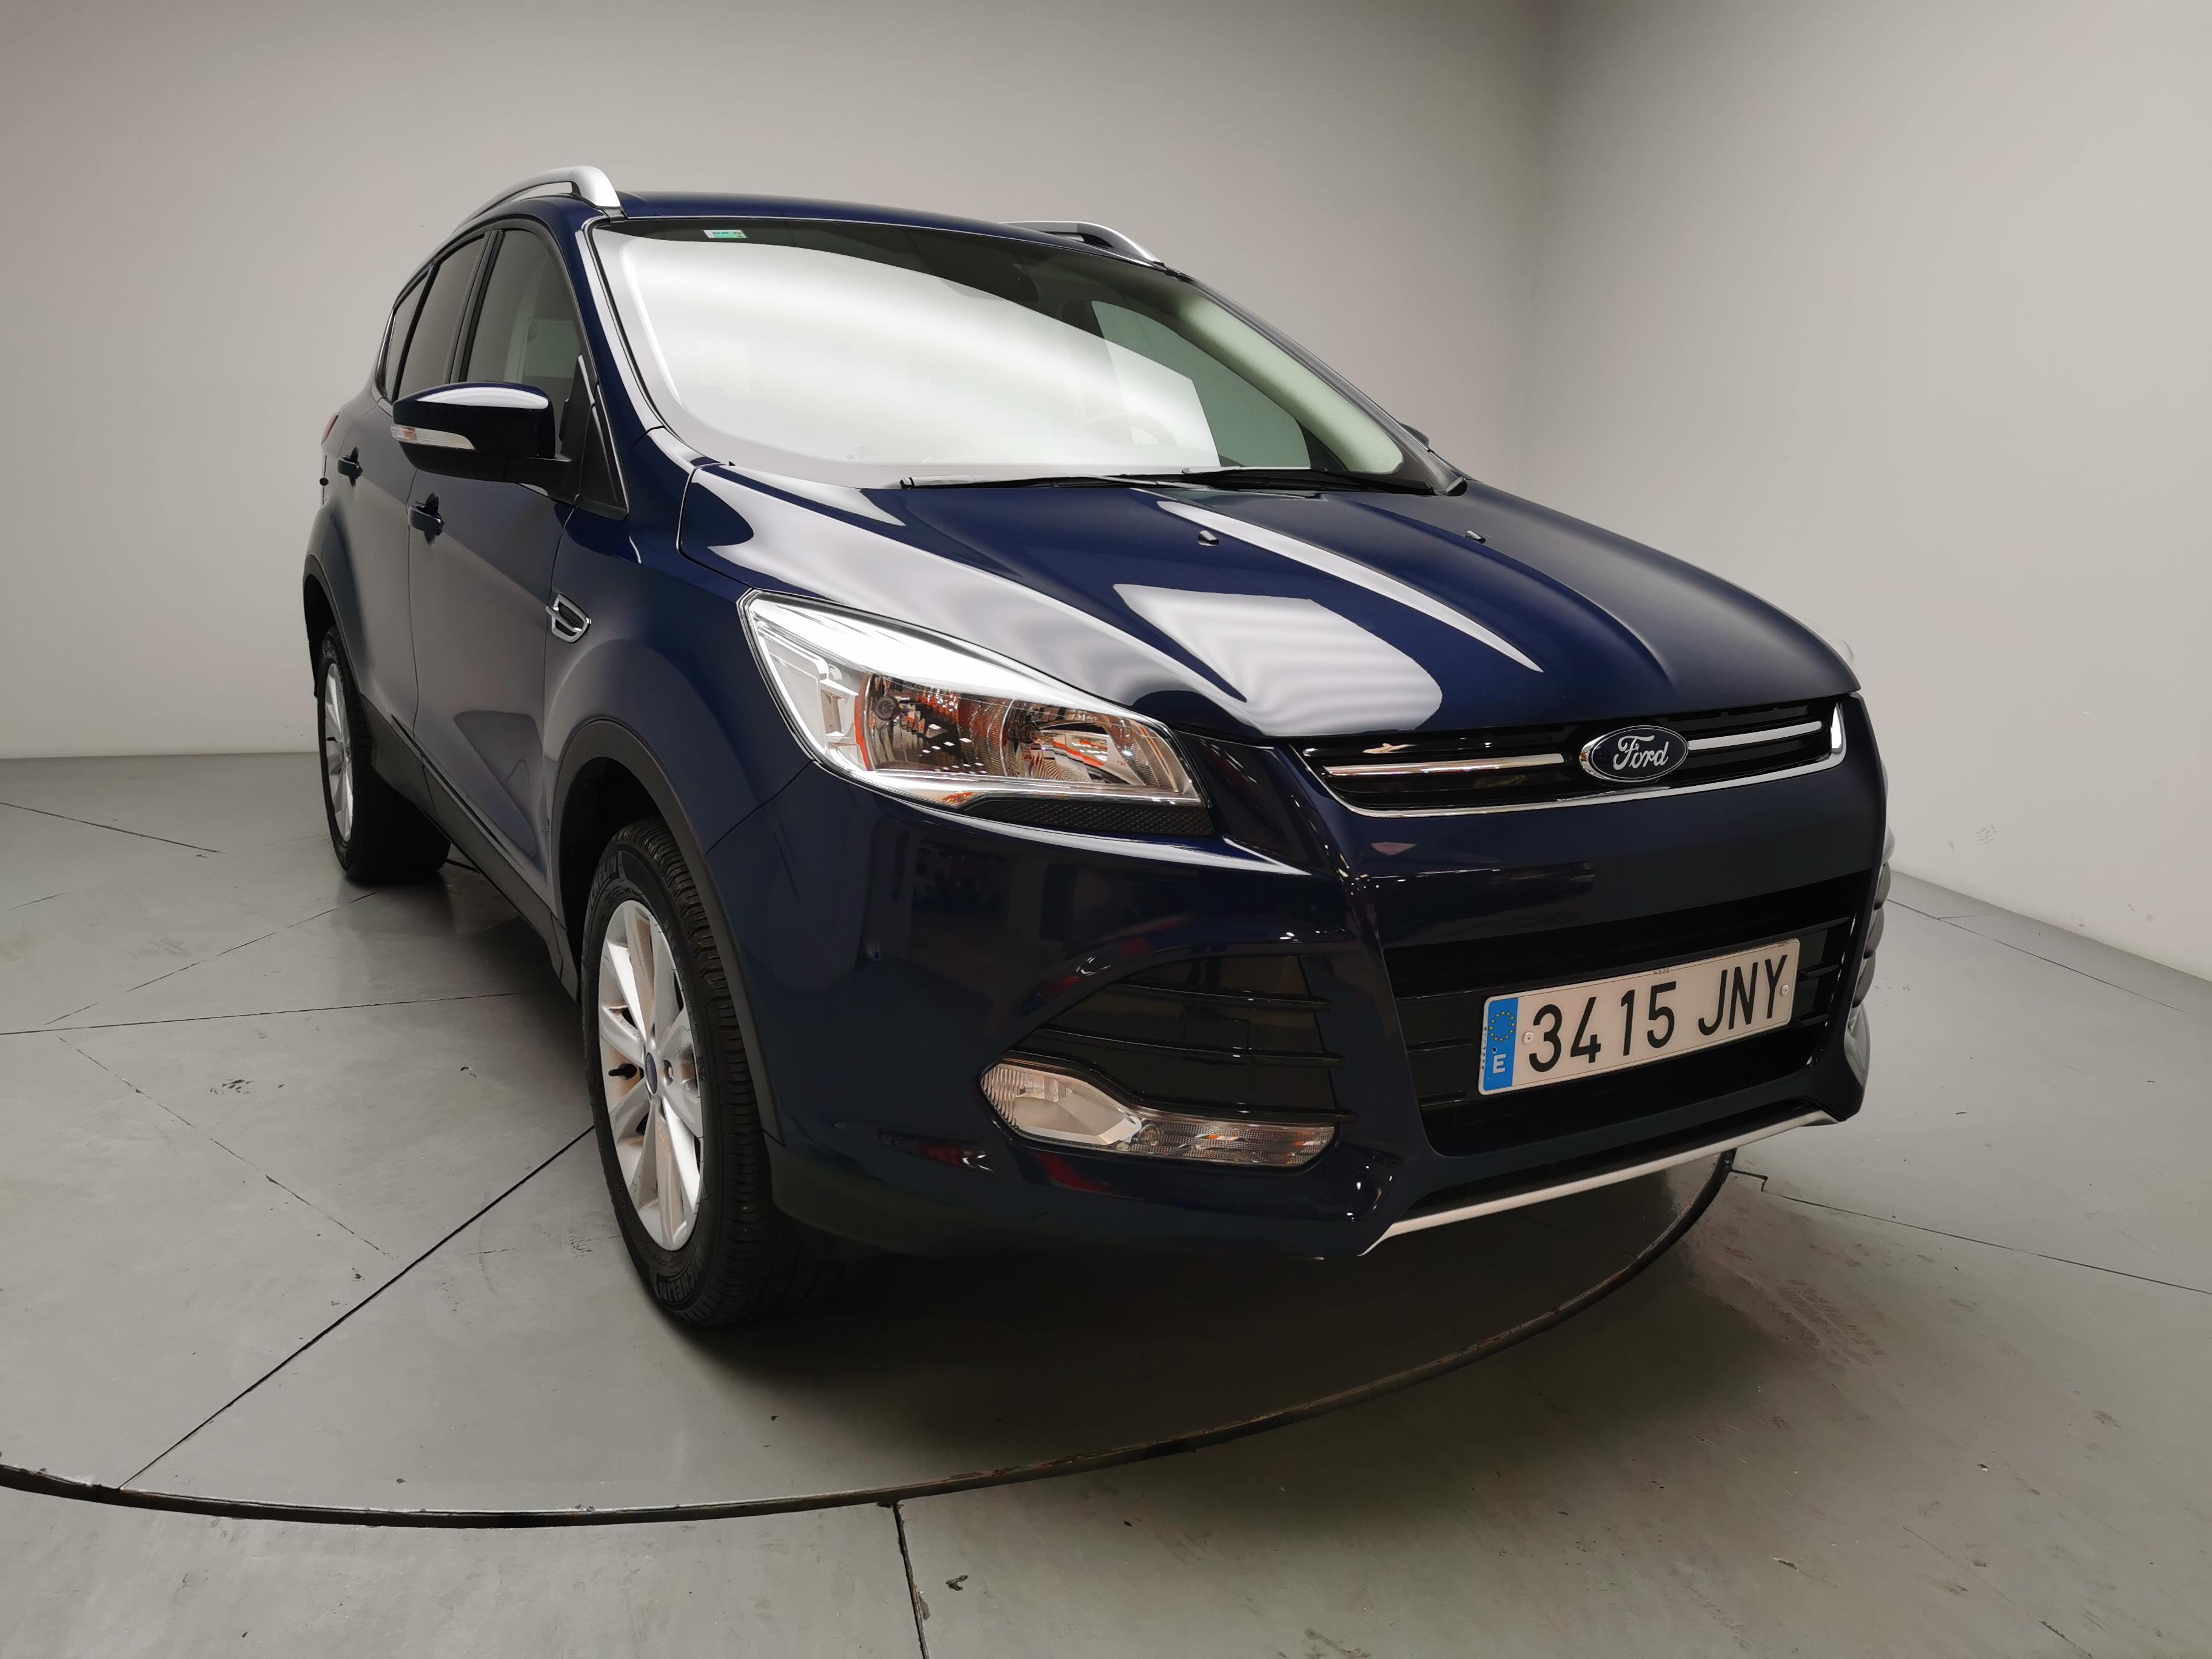 Ford Kuga ocasión segunda mano 2016 Gasolina por 20.500€ en Málaga